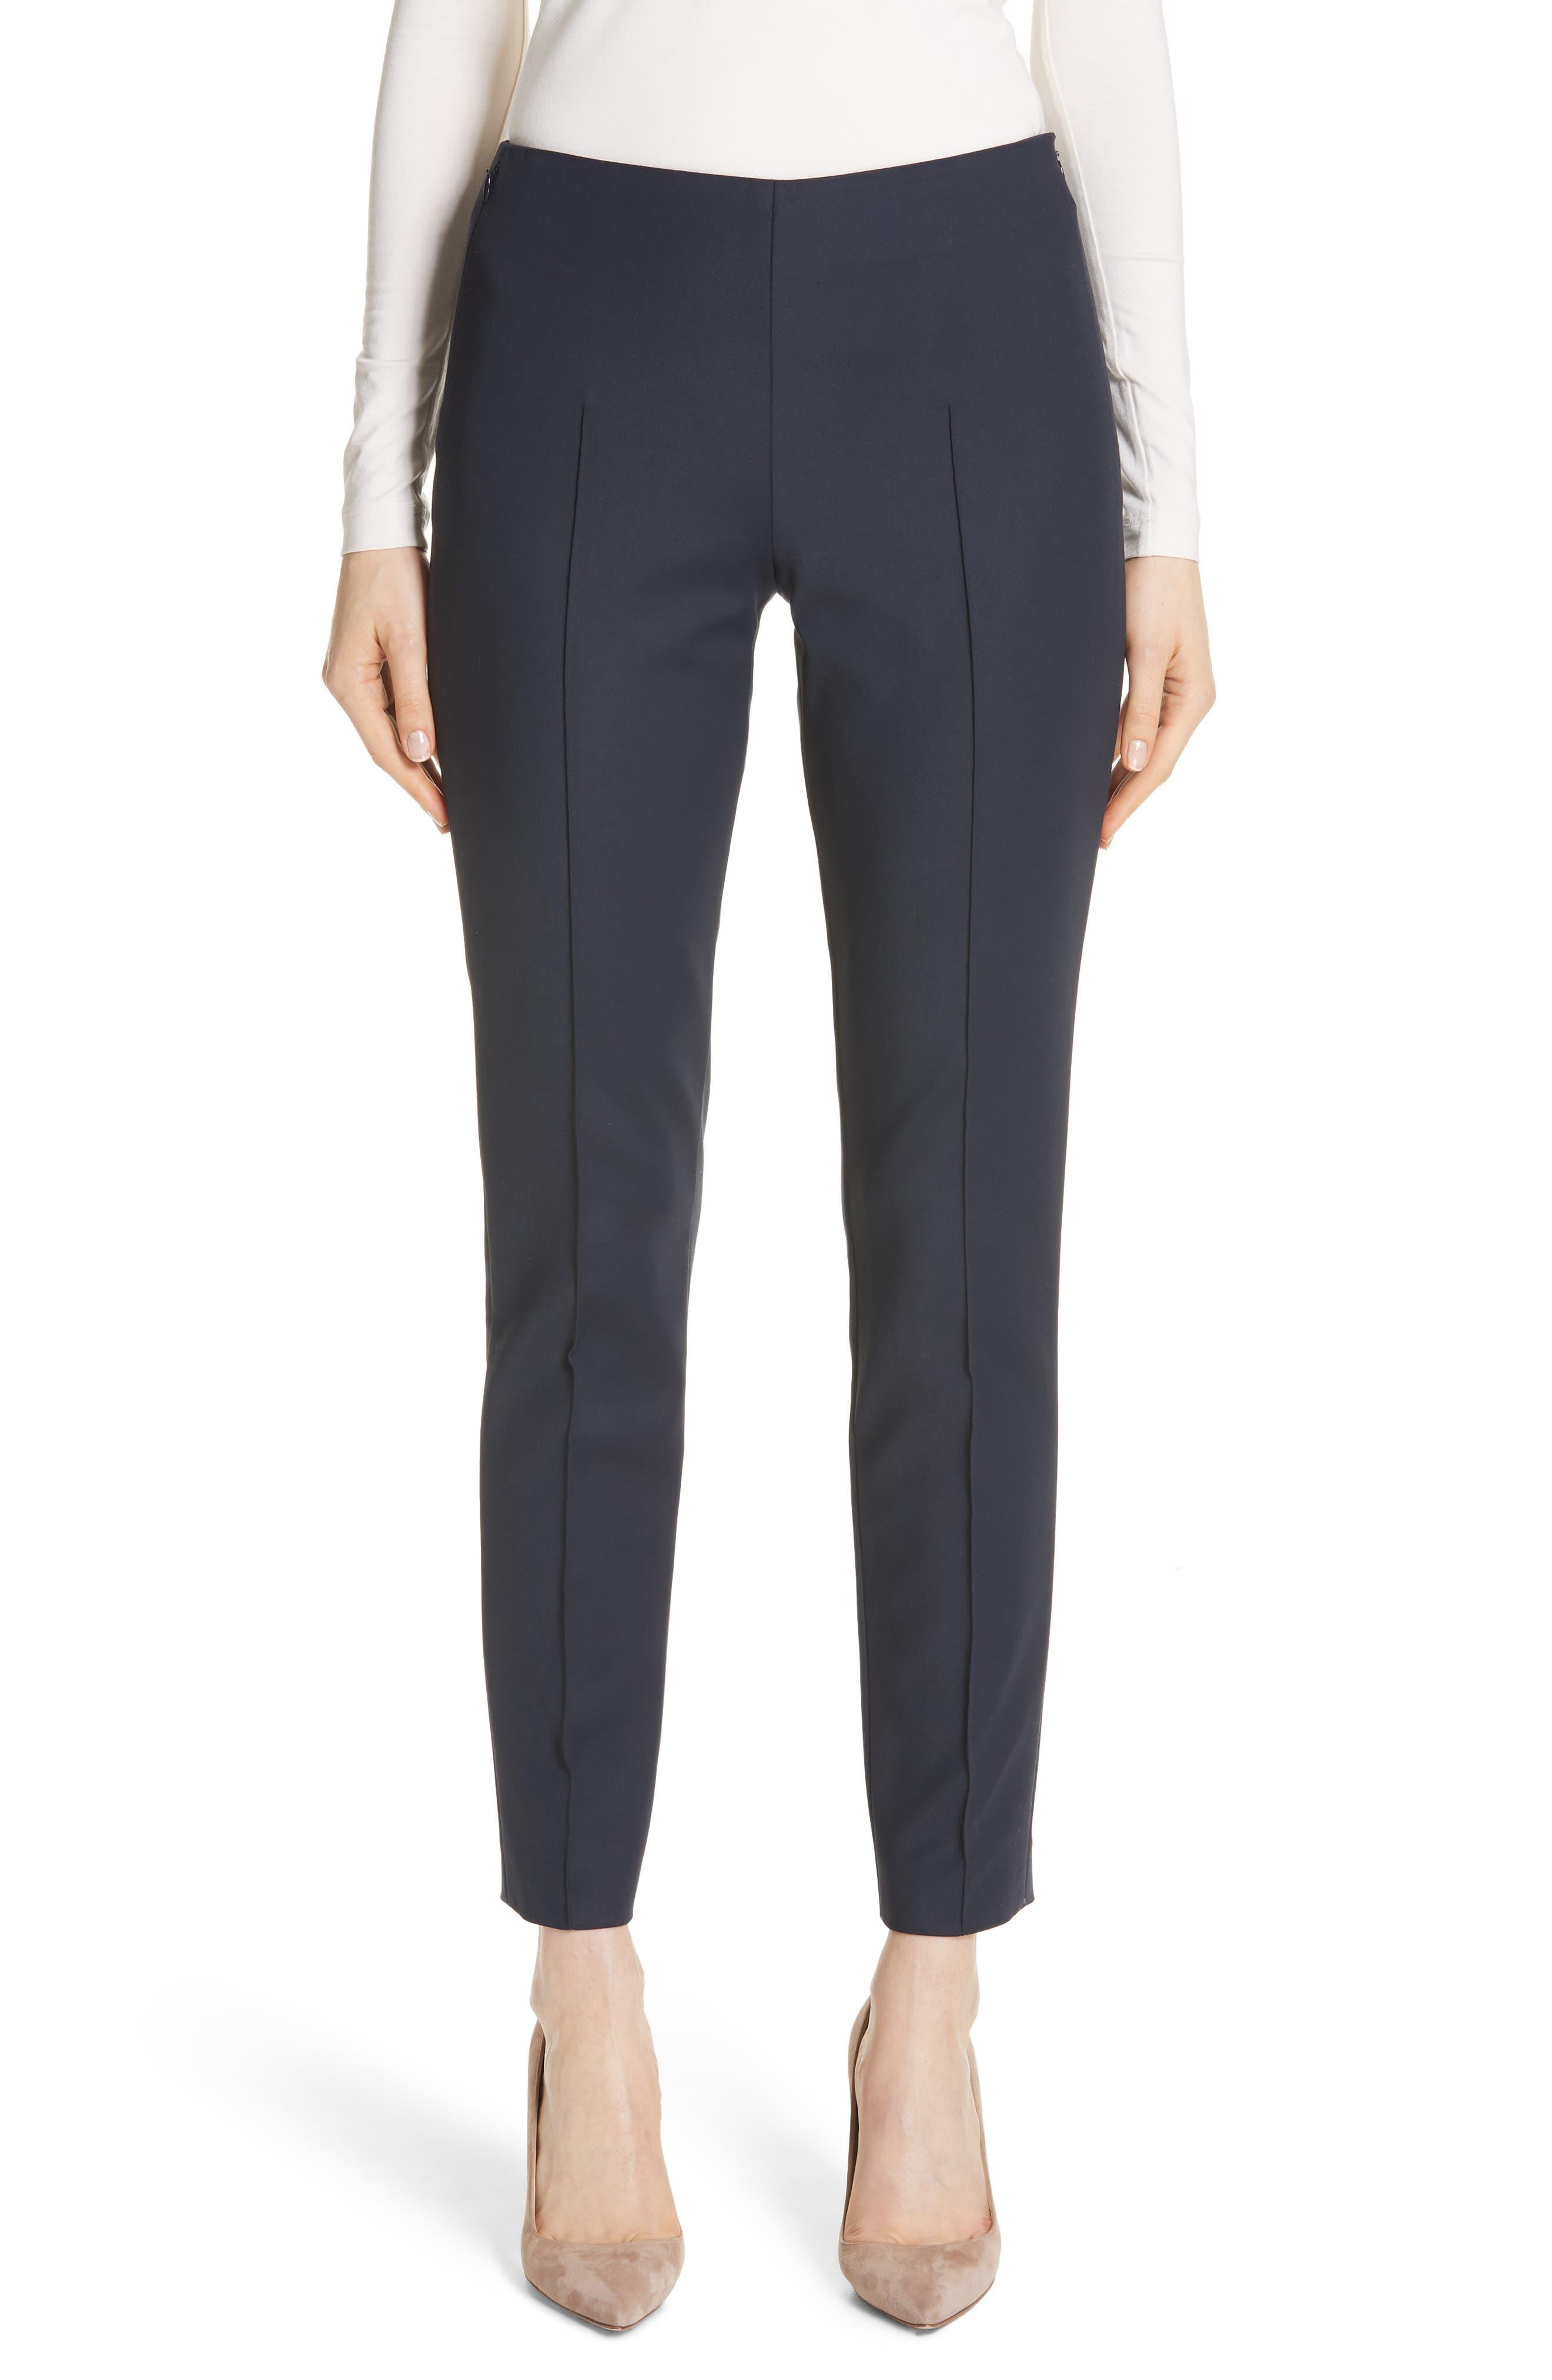 AKRIS, 'Melissa' Slim Techno Cotton Ankle Pants, Main thumbnail 1, color, NAVY